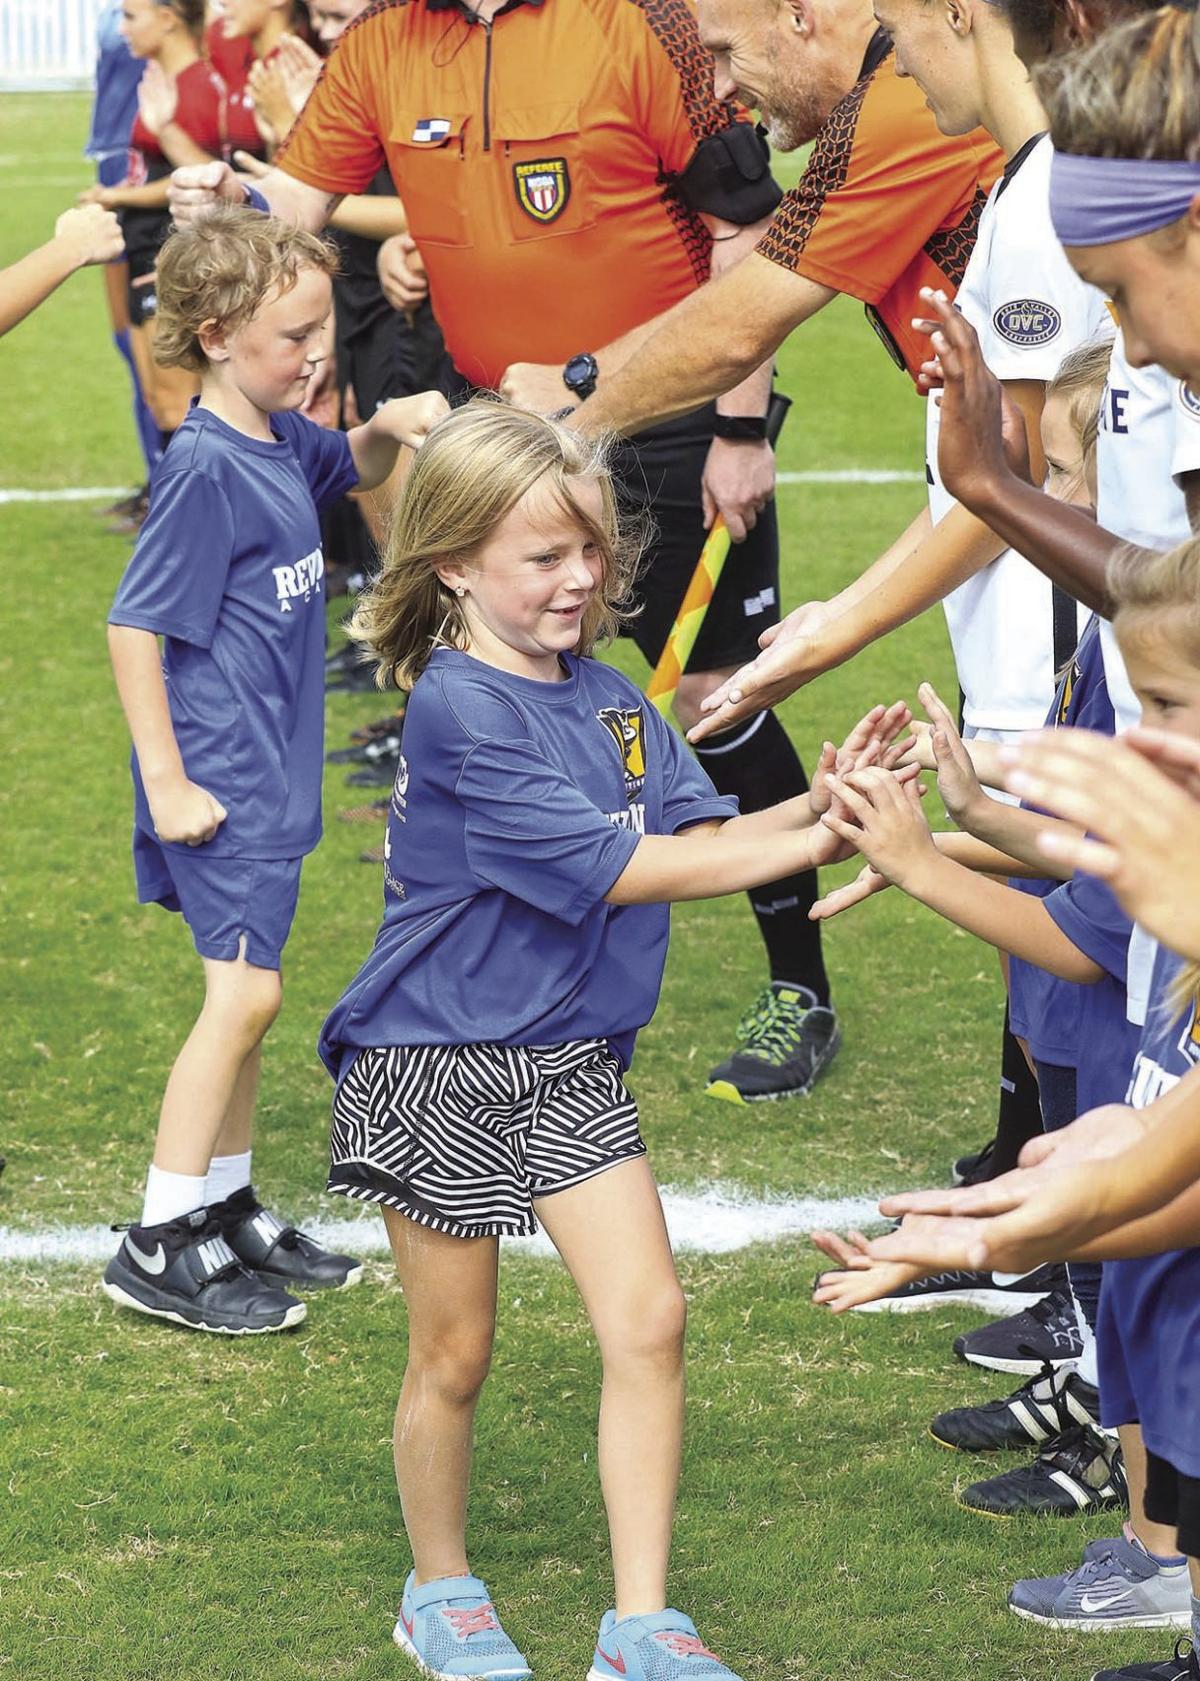 MCCSA spring soccer season postponed